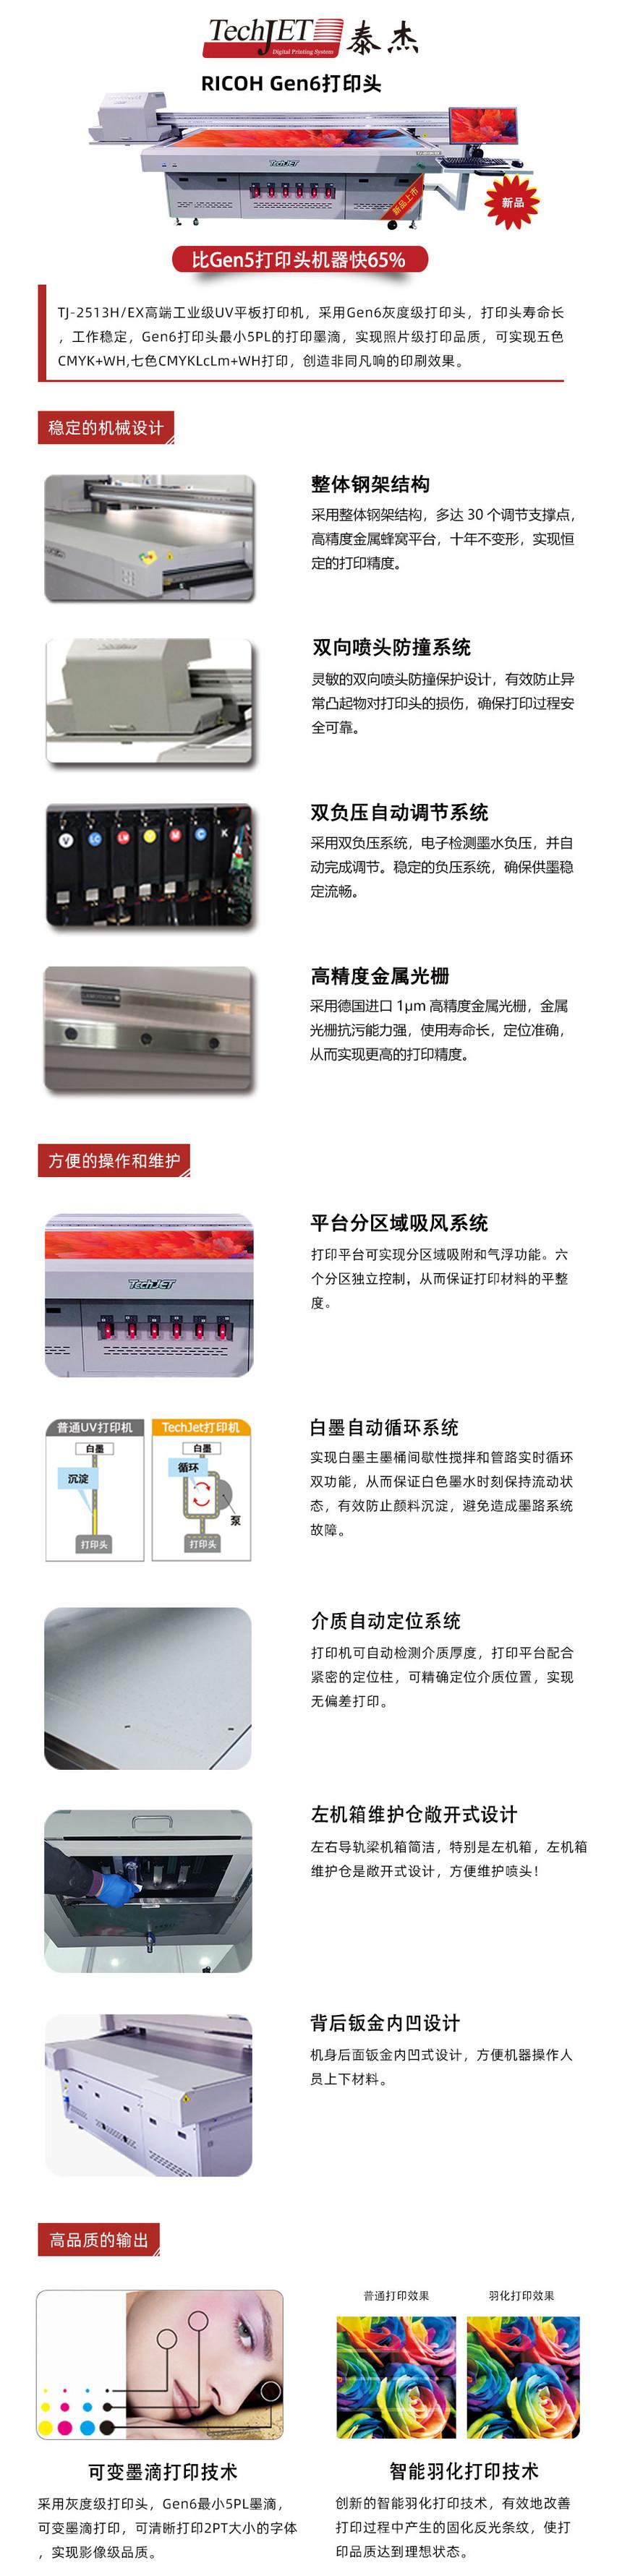 2513HEX中文产品说明网站版-.jpg